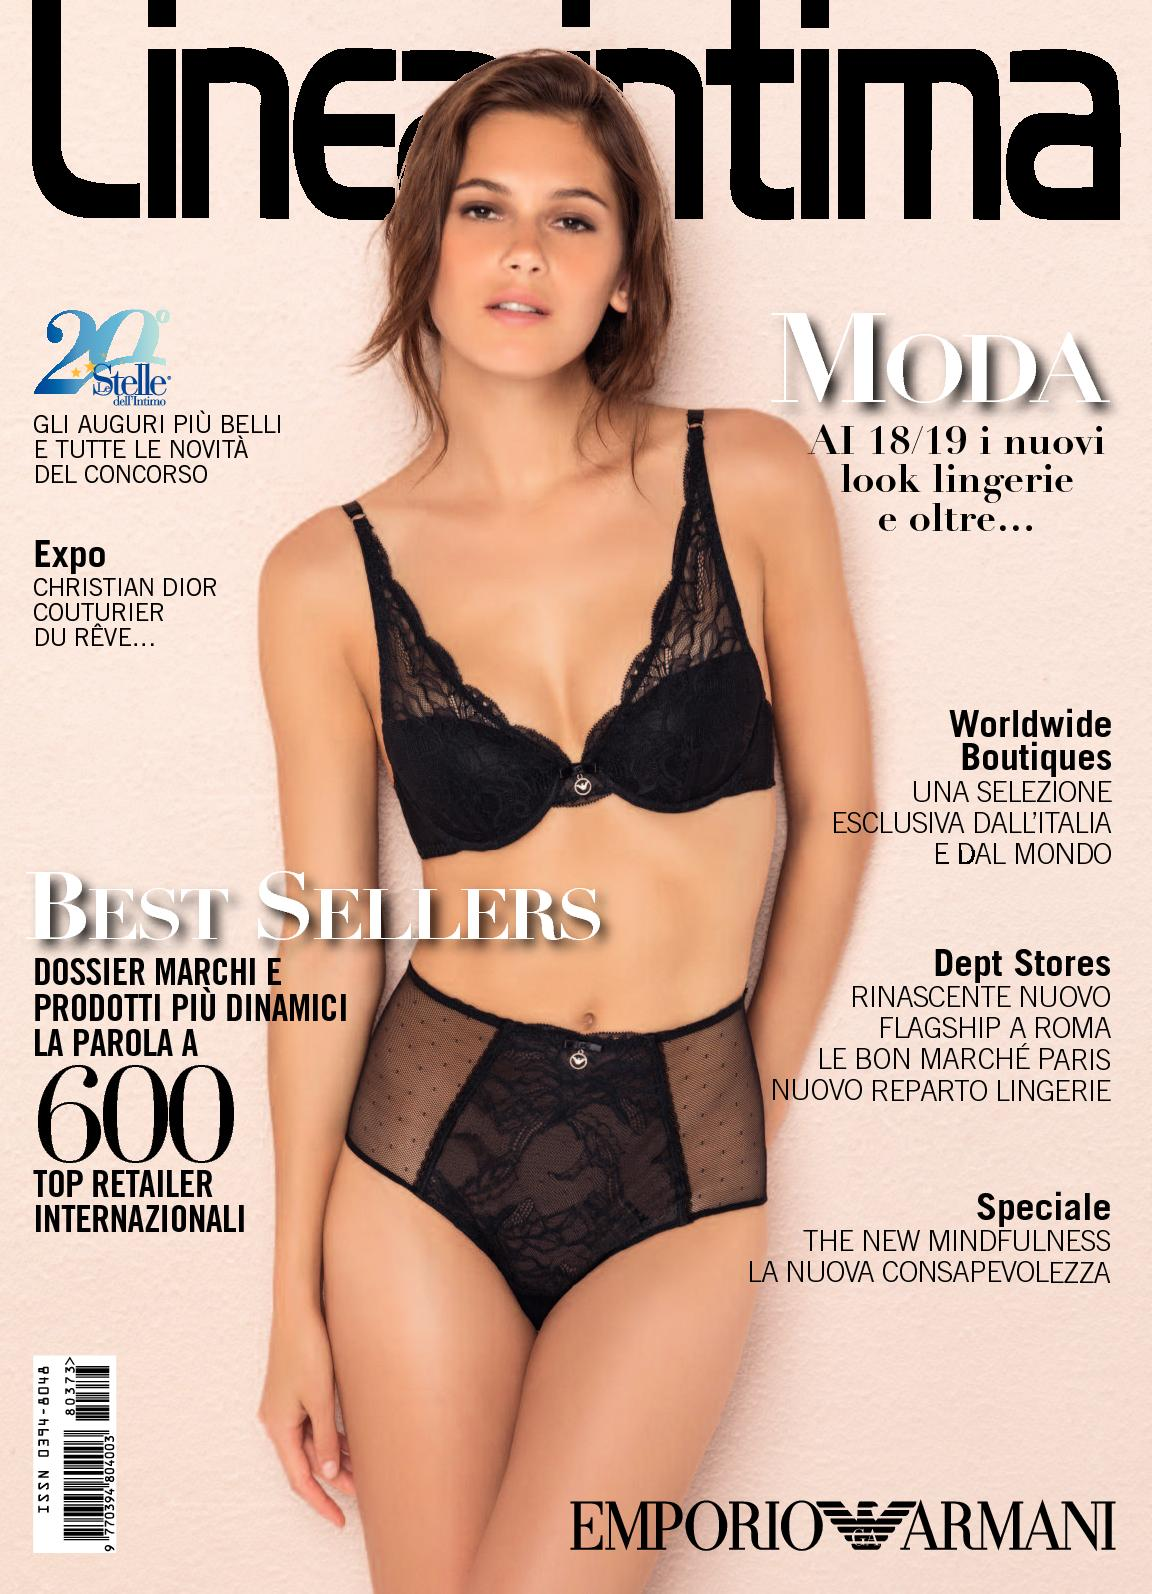 Yours Clothing Women/'s Plus Size rosa shocking Reggiseno Maglia a pois con finitura in pizzo